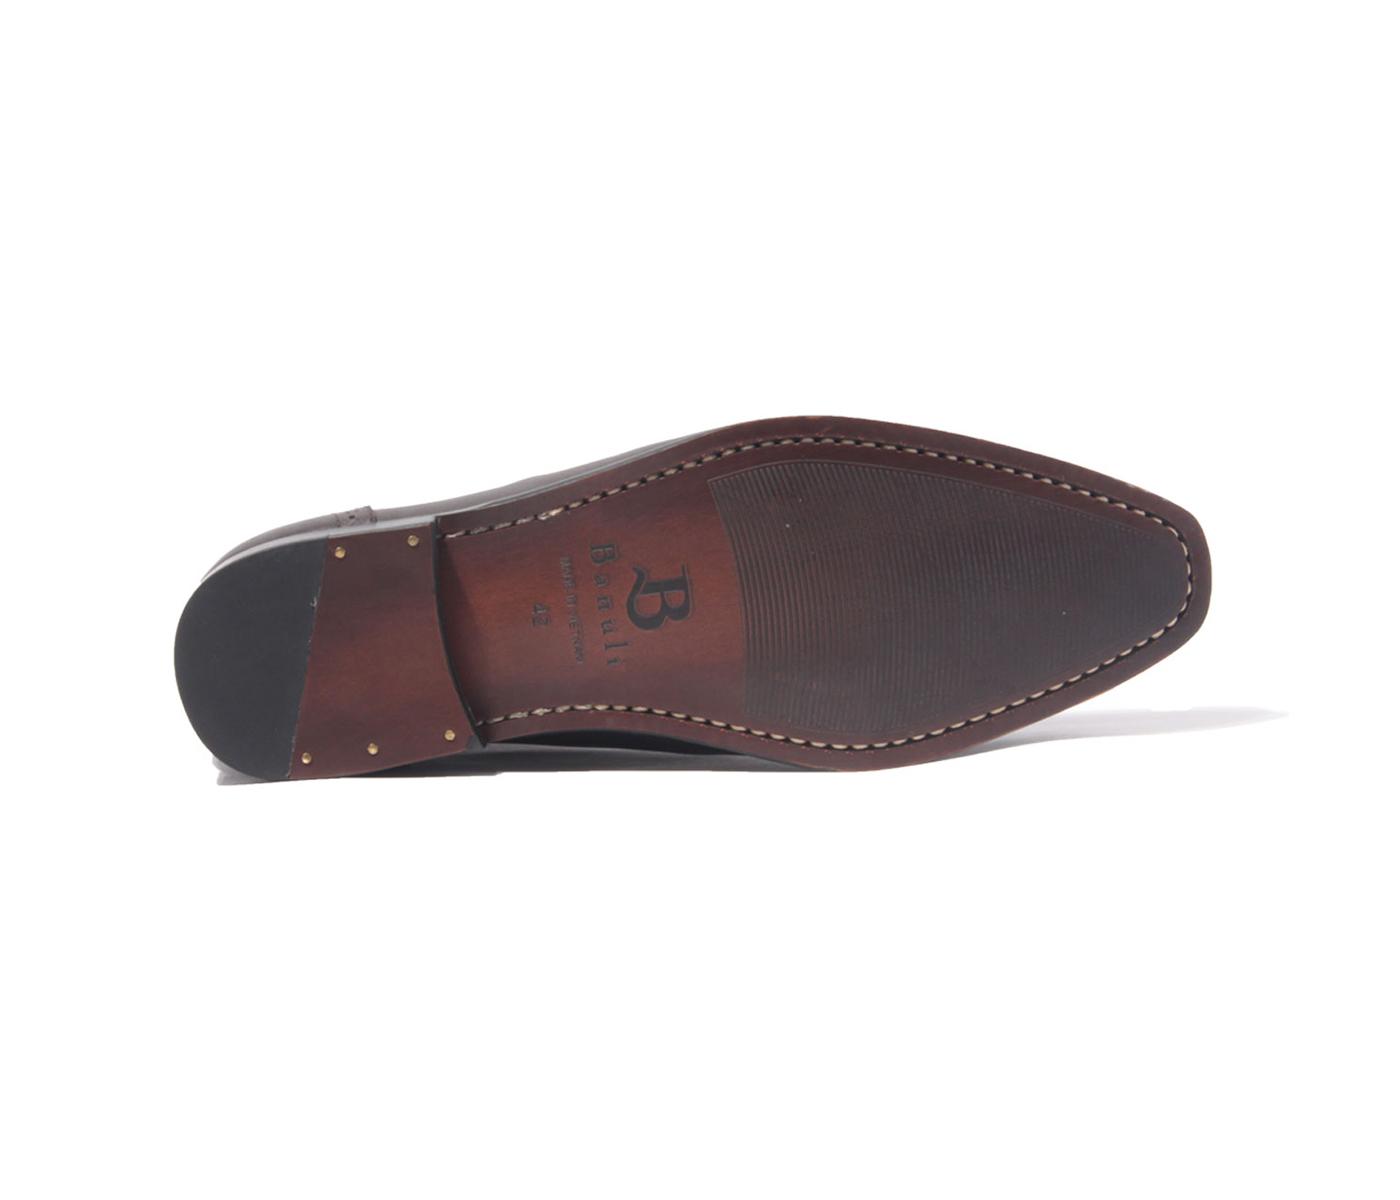 Giày Tây Nam Cao Cấp Wholecut Patina H1WH1M0